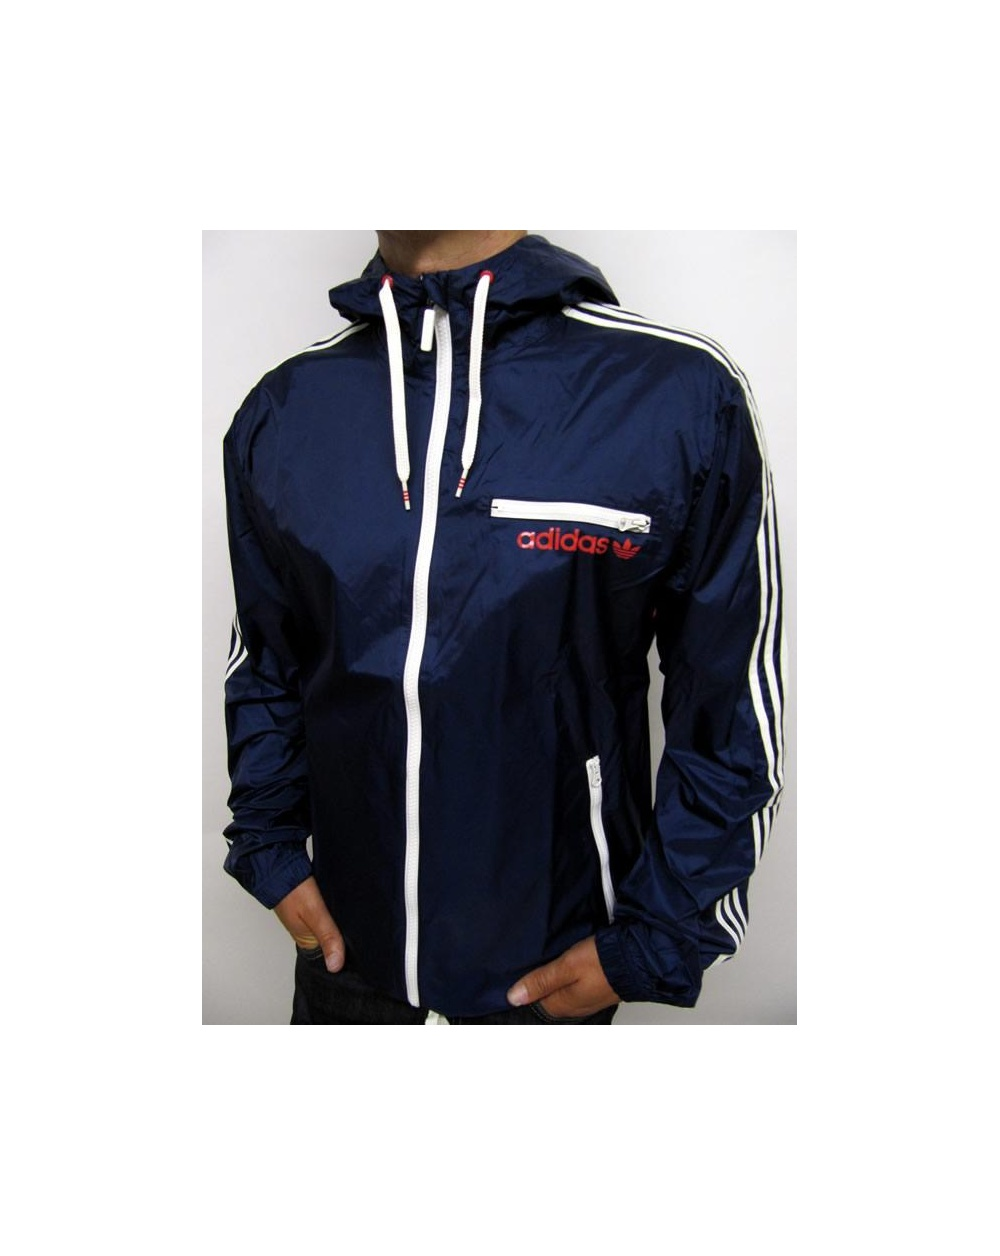 Adidas Originals Retro Rainproof Jacket Navy White